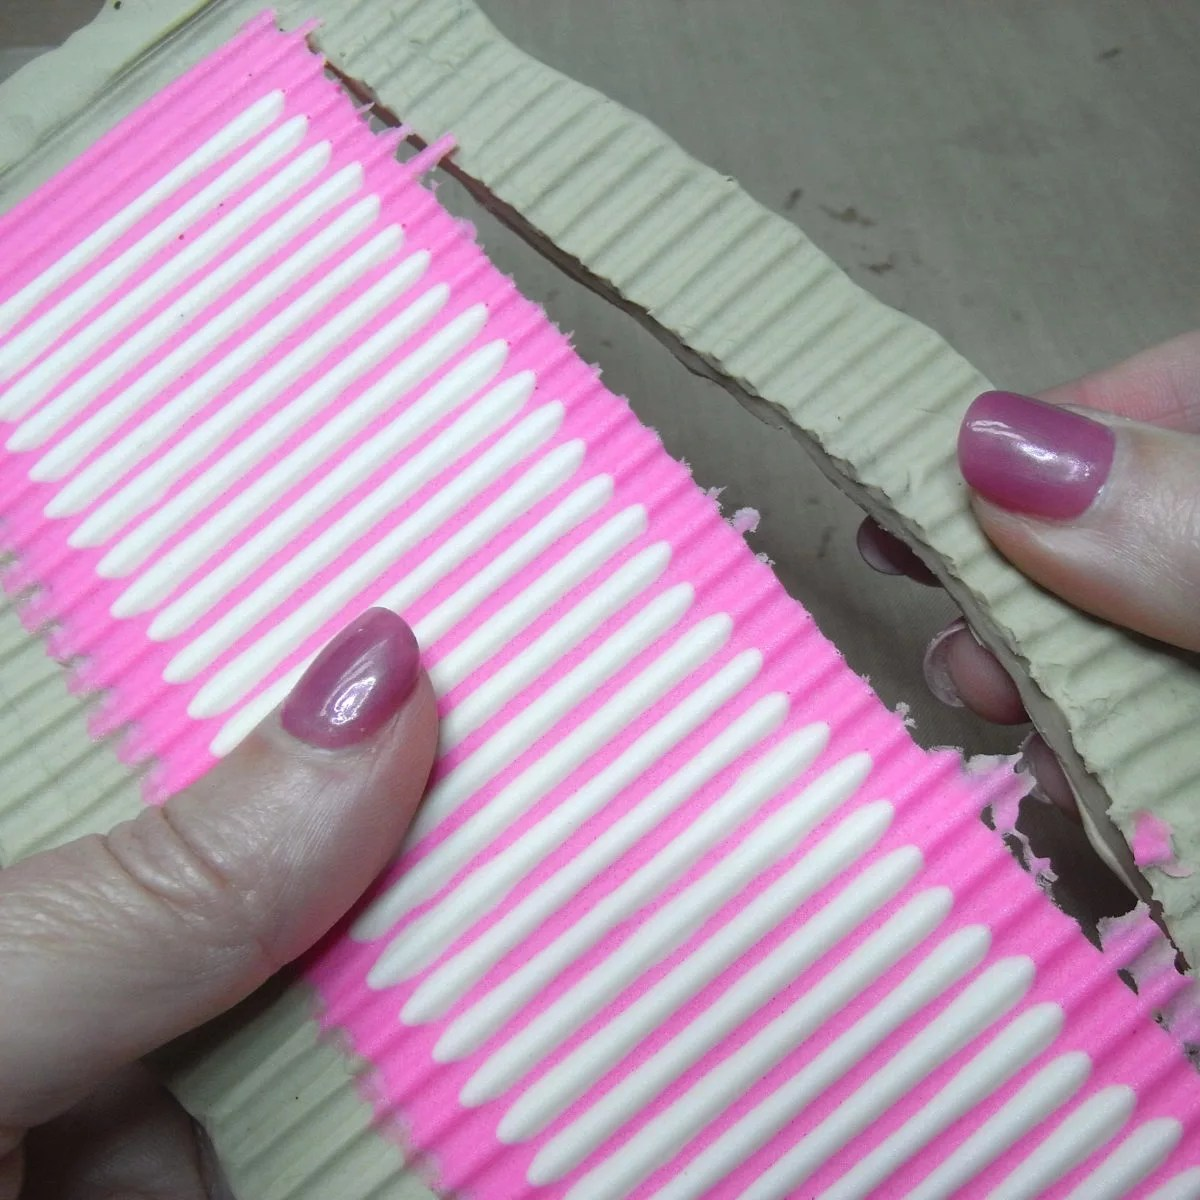 peeling away clay from resin